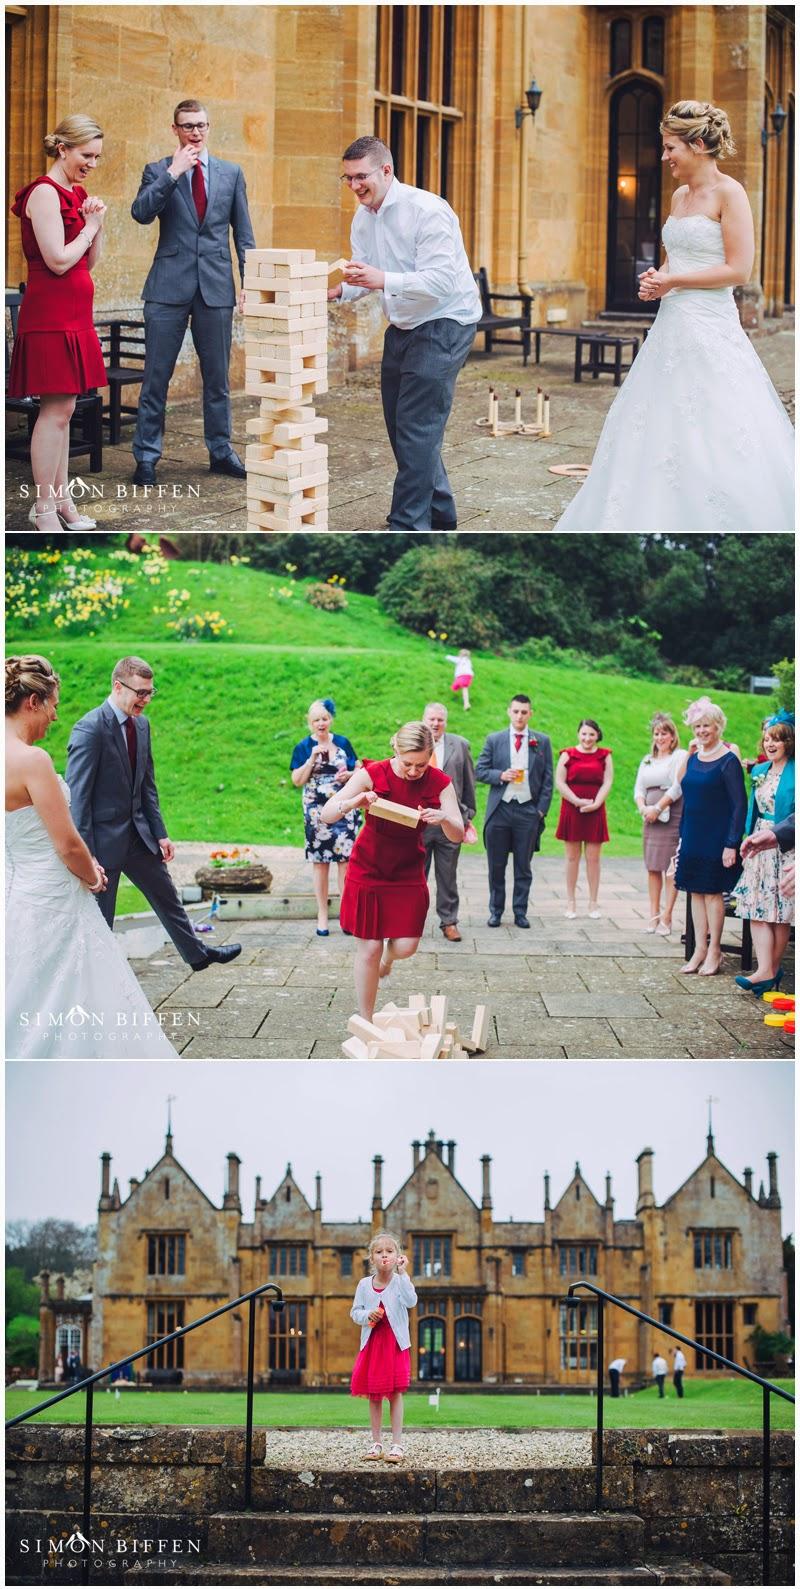 Wedding guests enjoying garden games at Dillington House